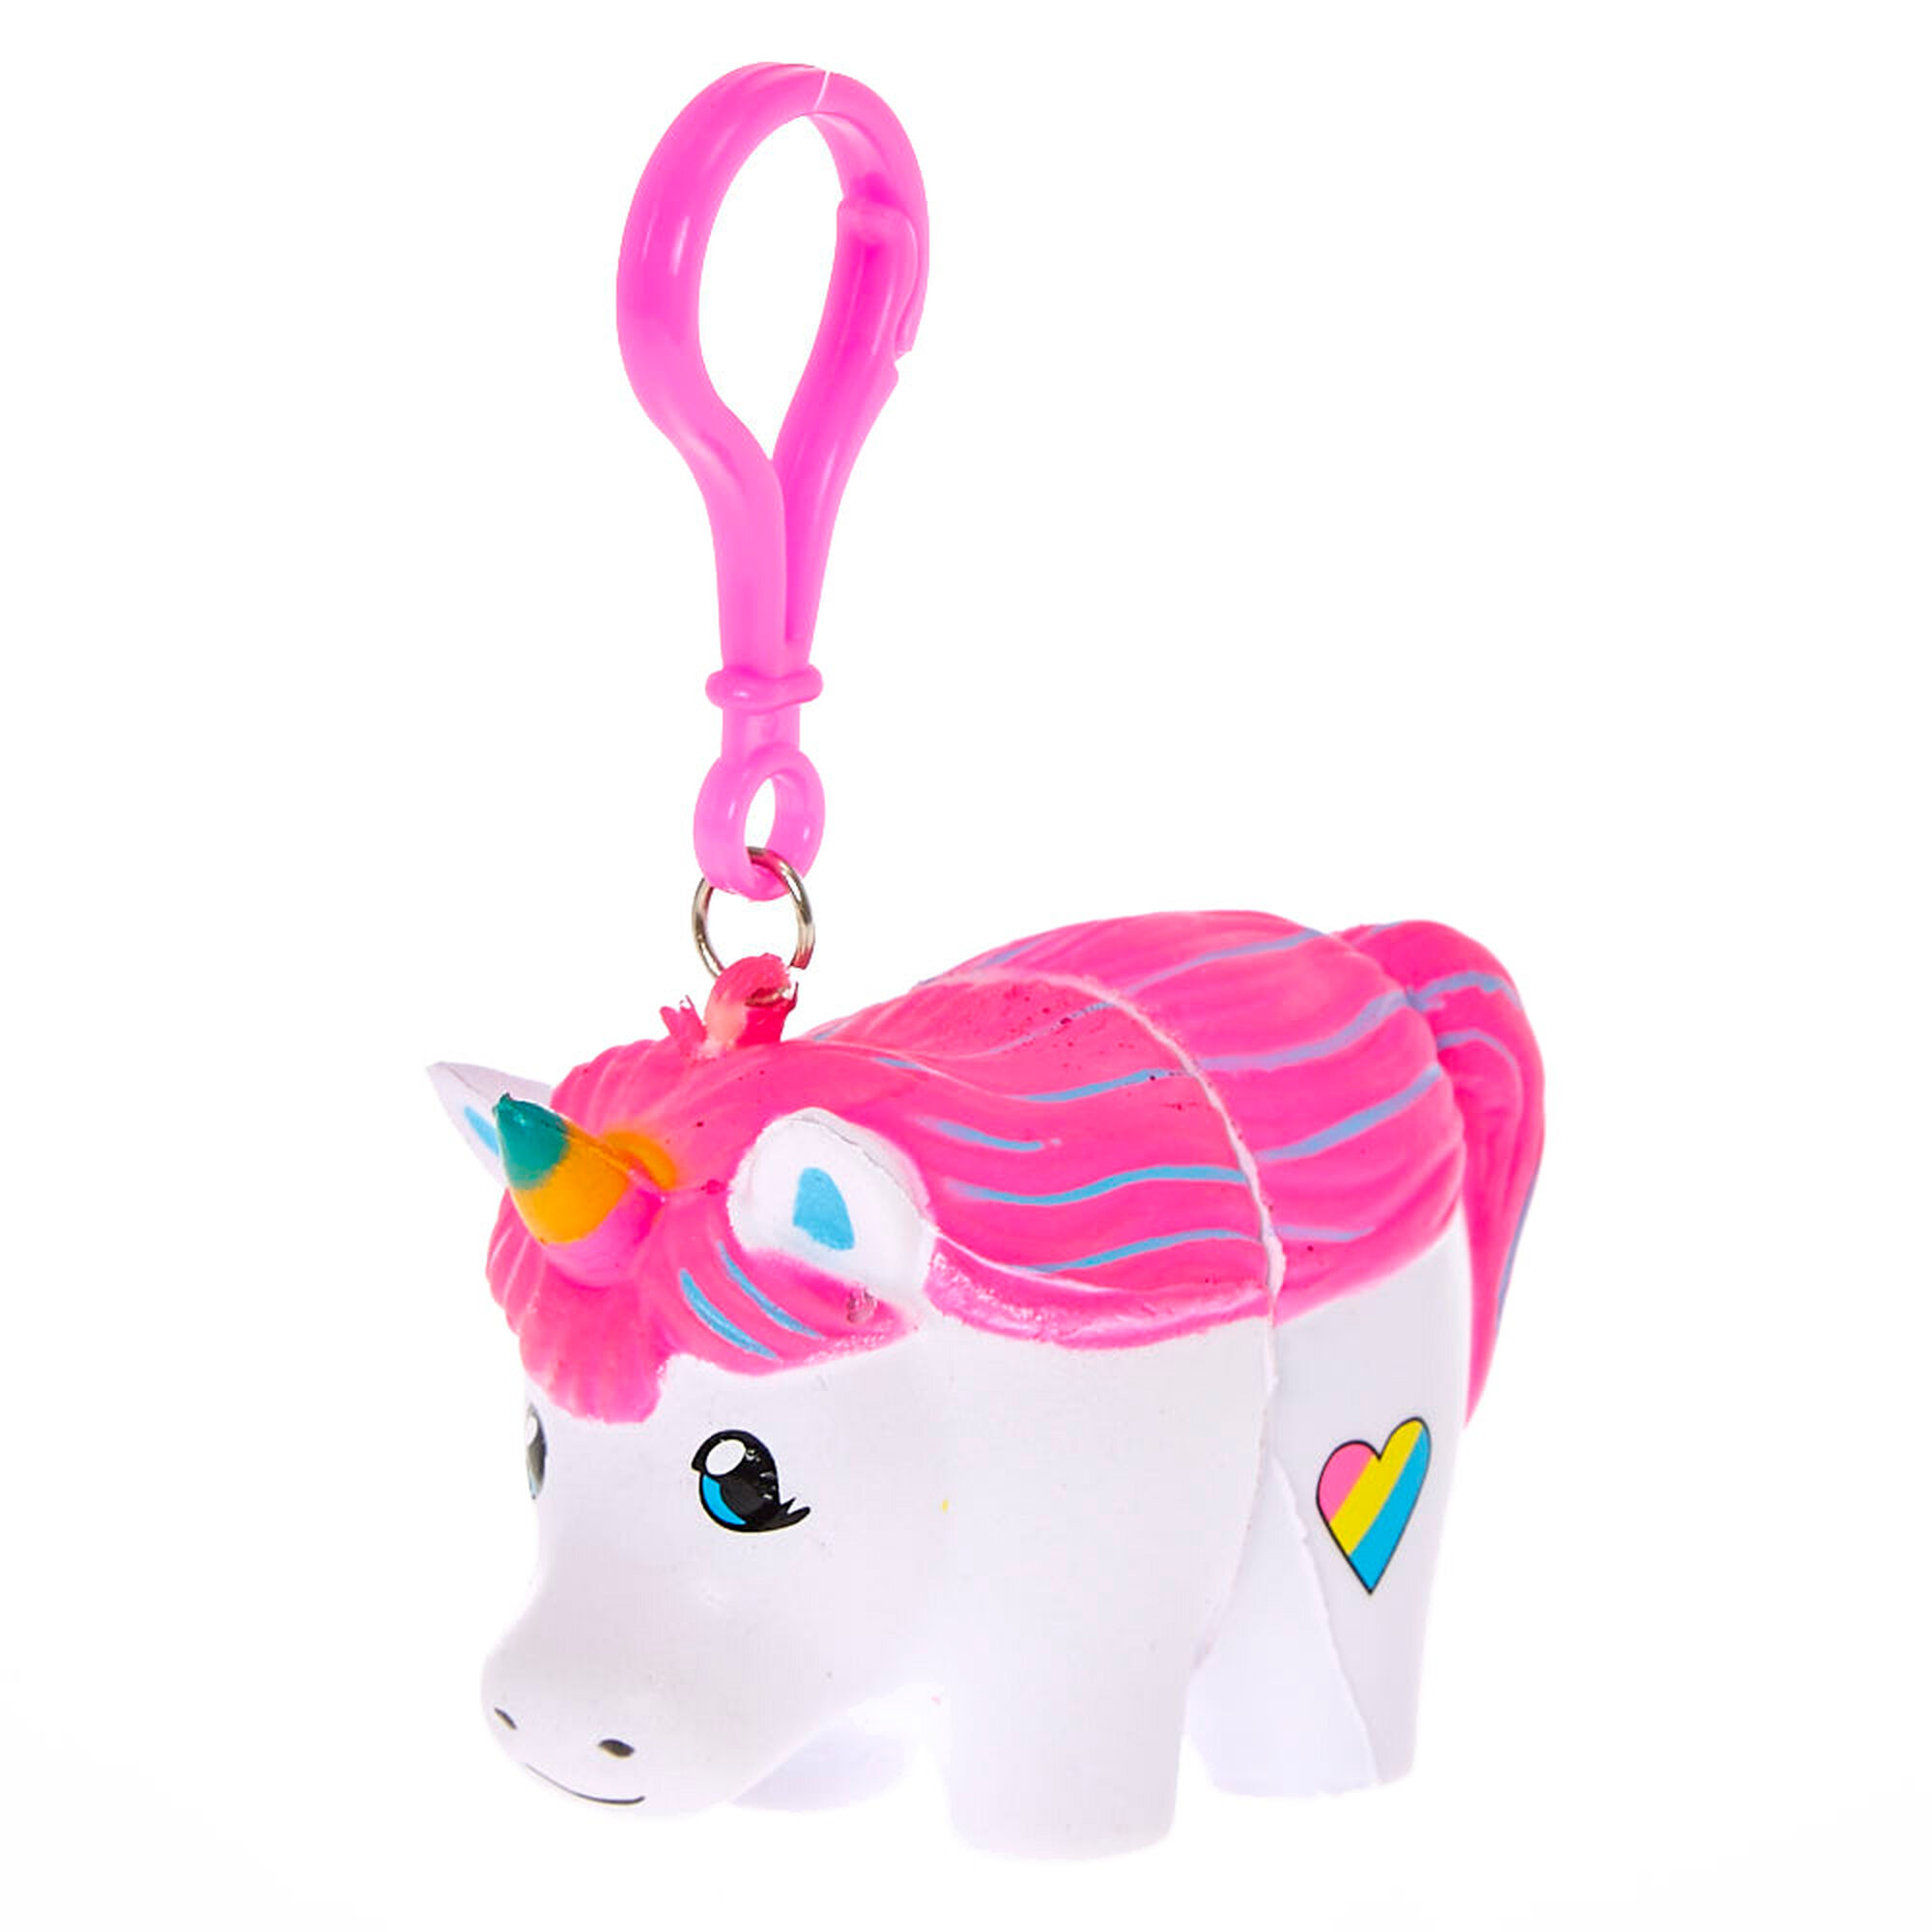 YoYo Squeeze Lip Balm Unicorn Keychain Claire s CA